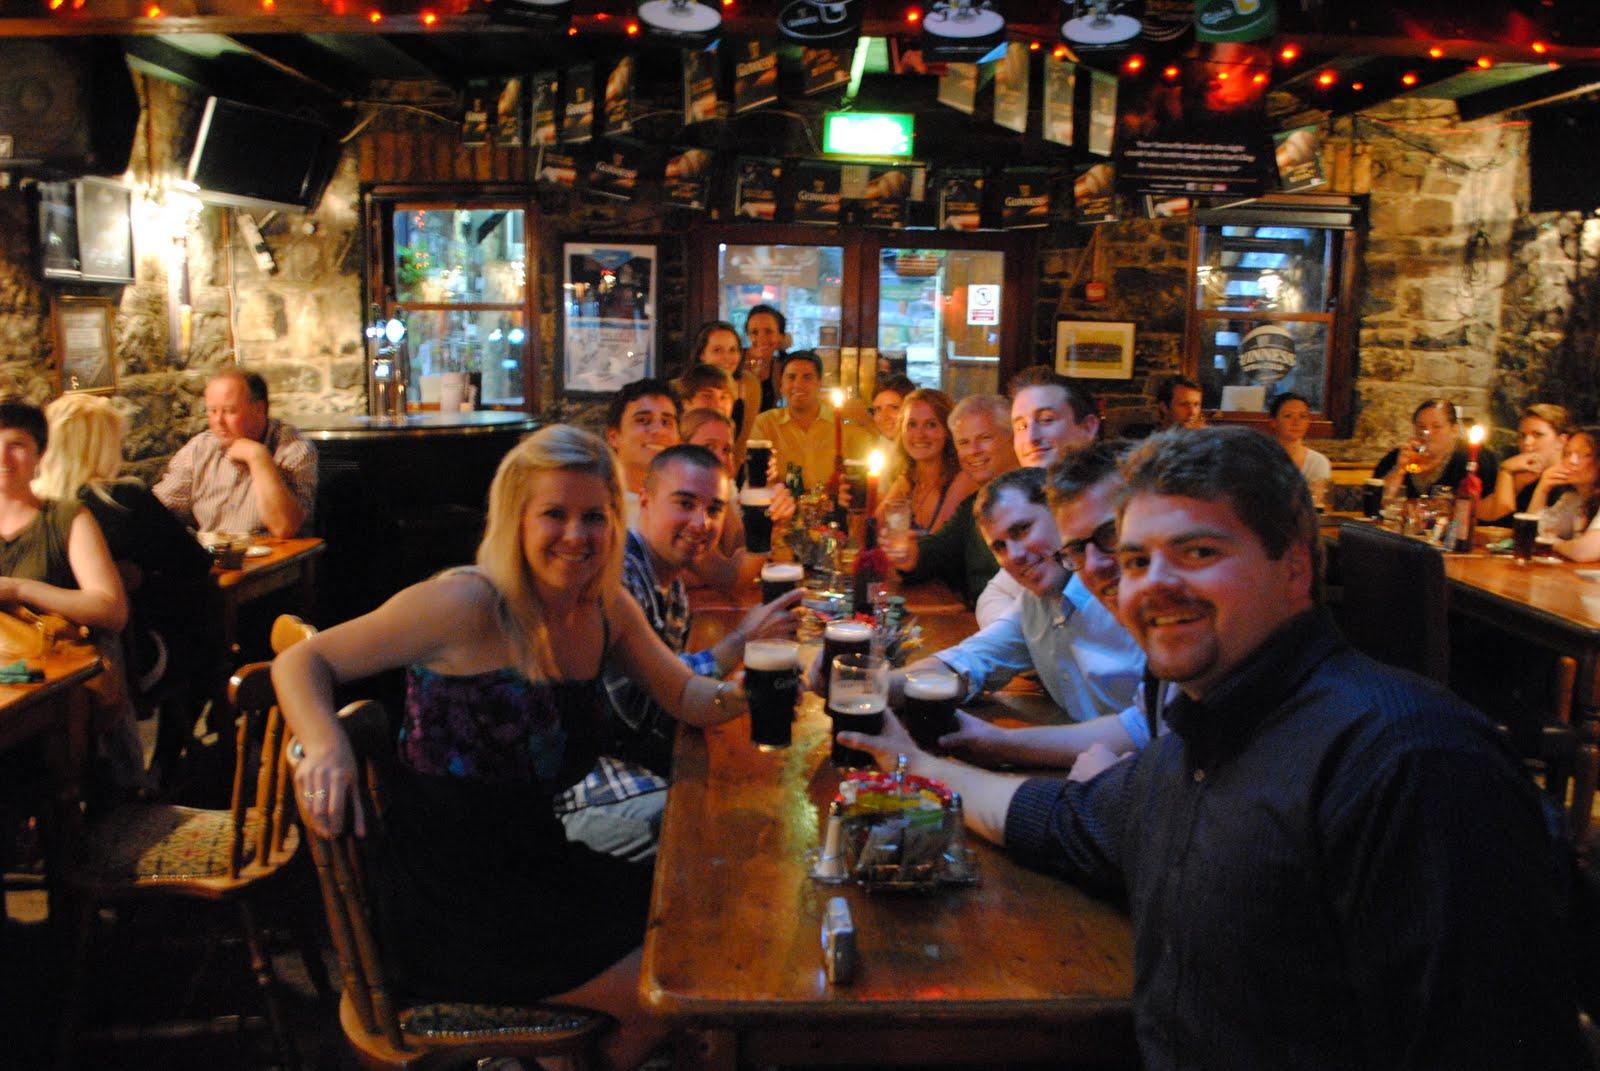 amk  pub night  limerick  ireland